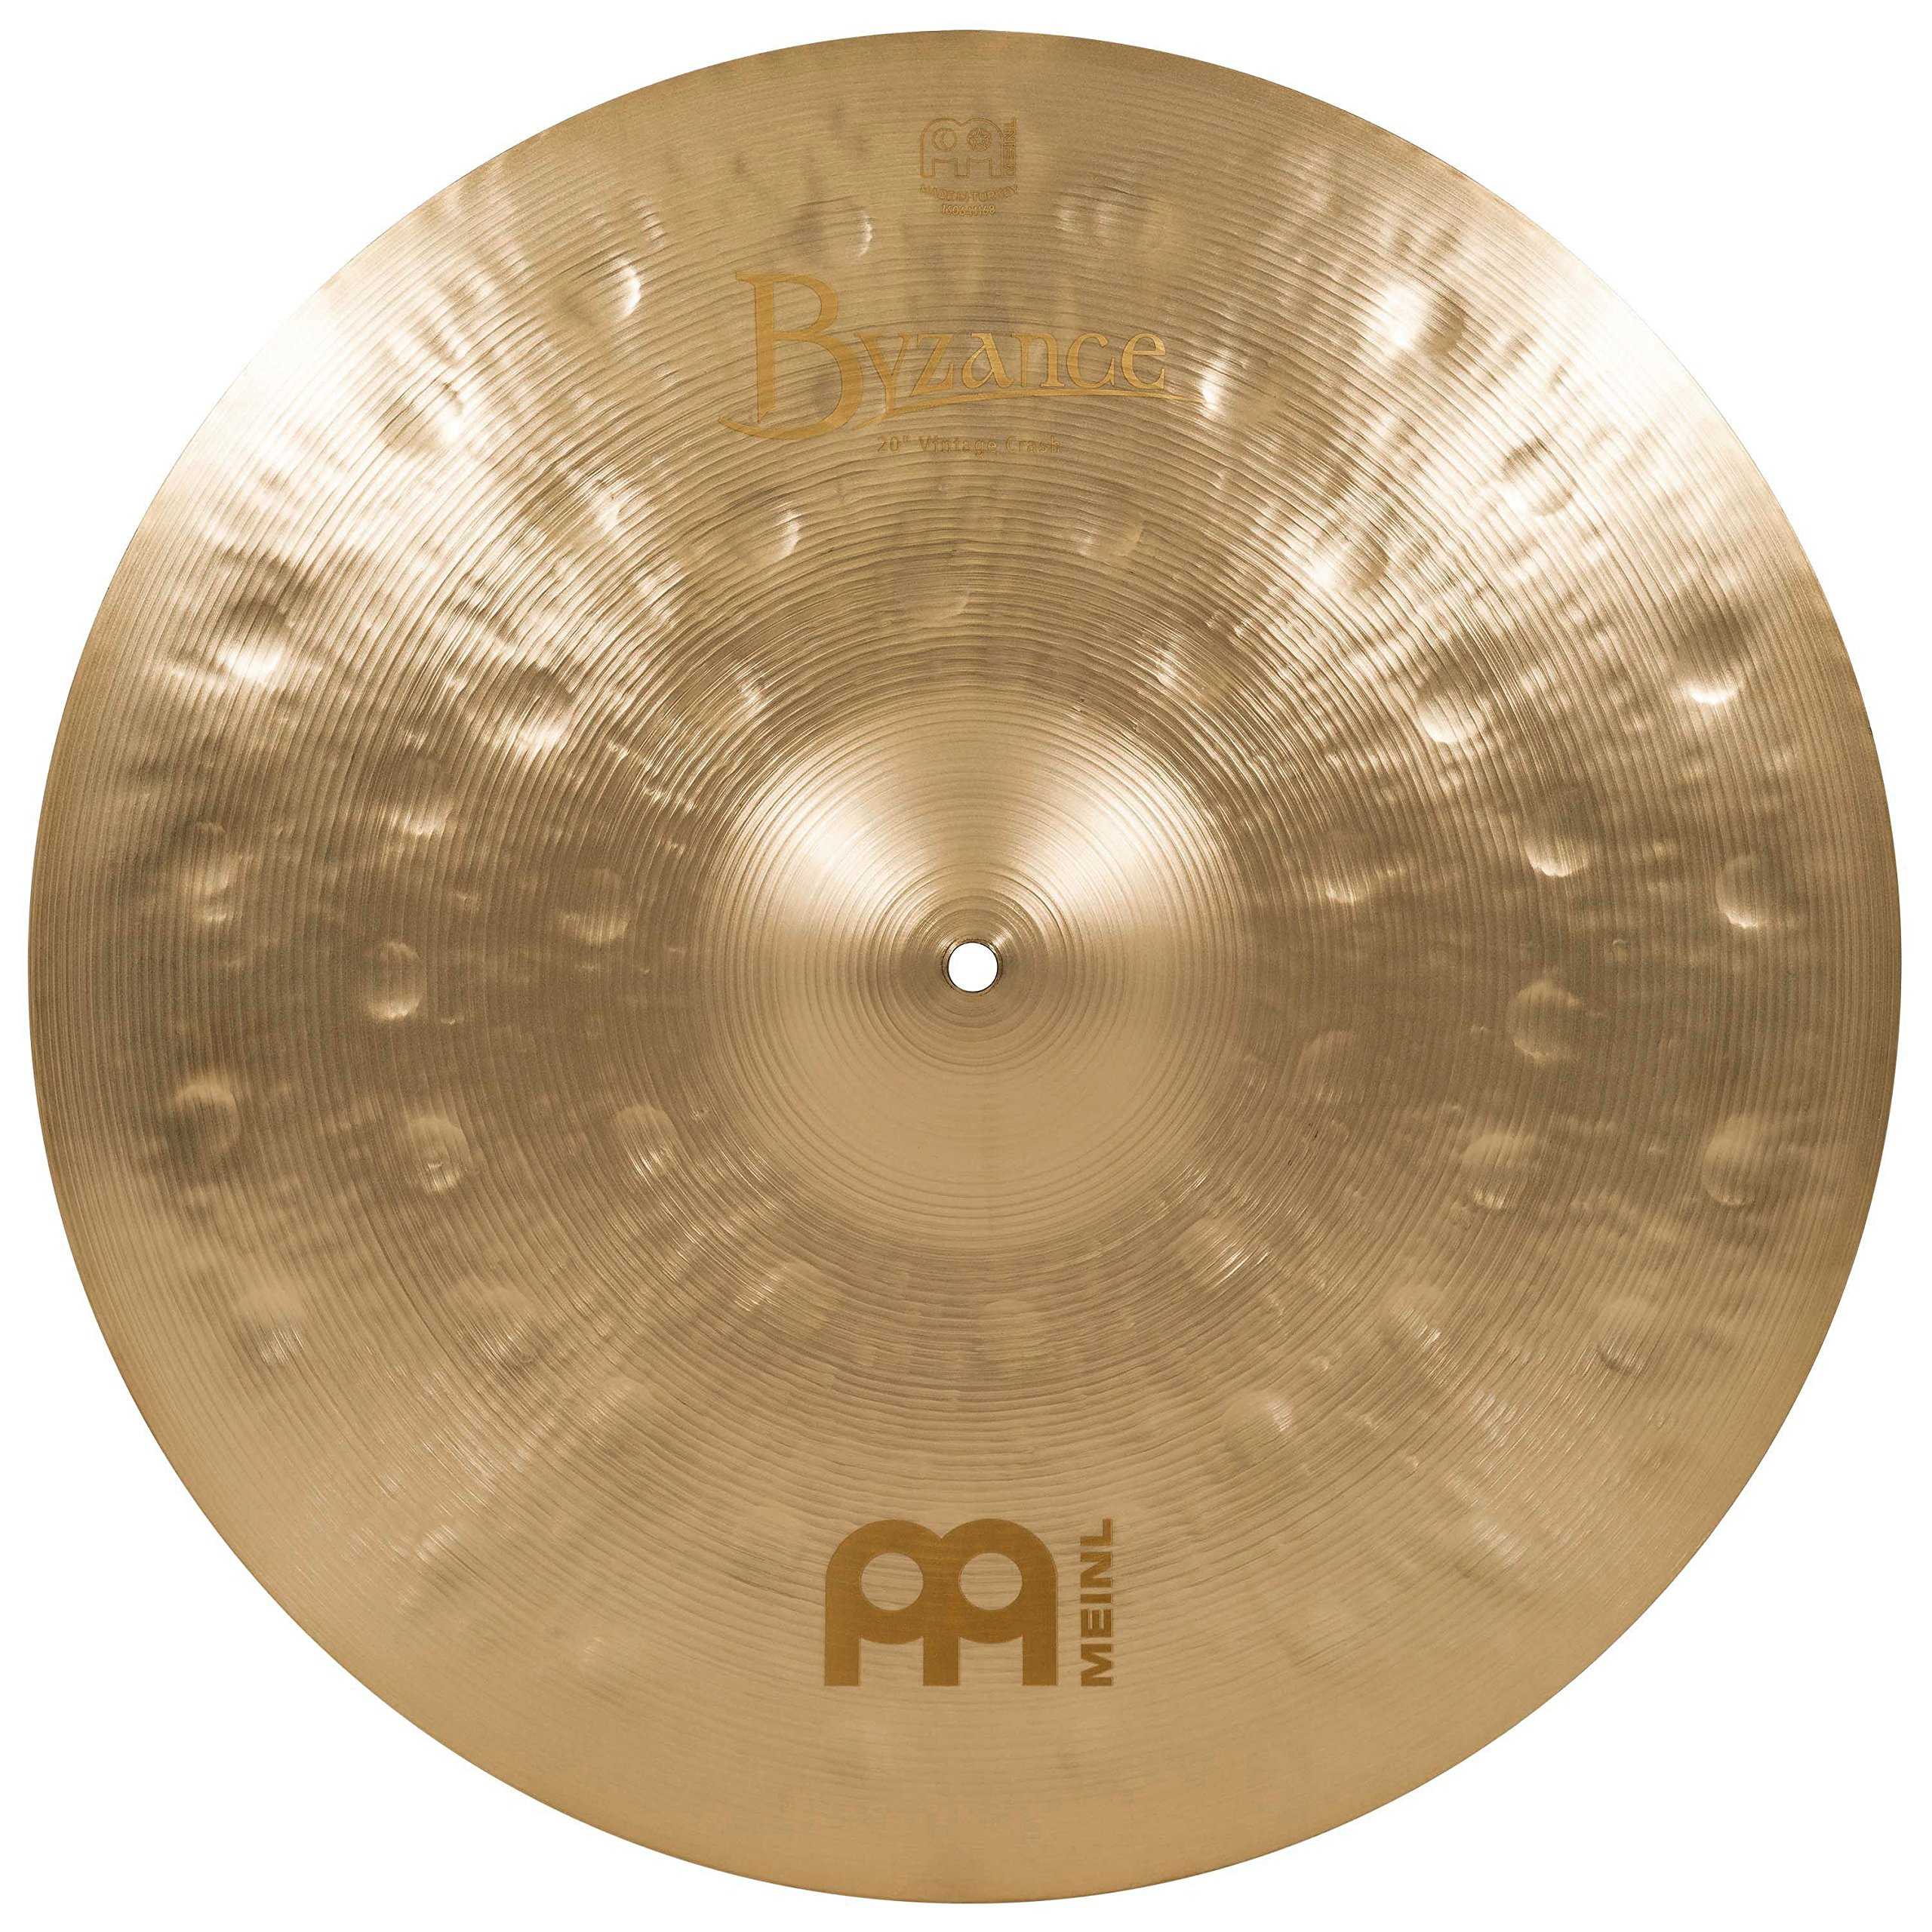 Meinl Cymbals B20VC Byzance 20-Inch Vintage Crash Cymbal (VIDEO)